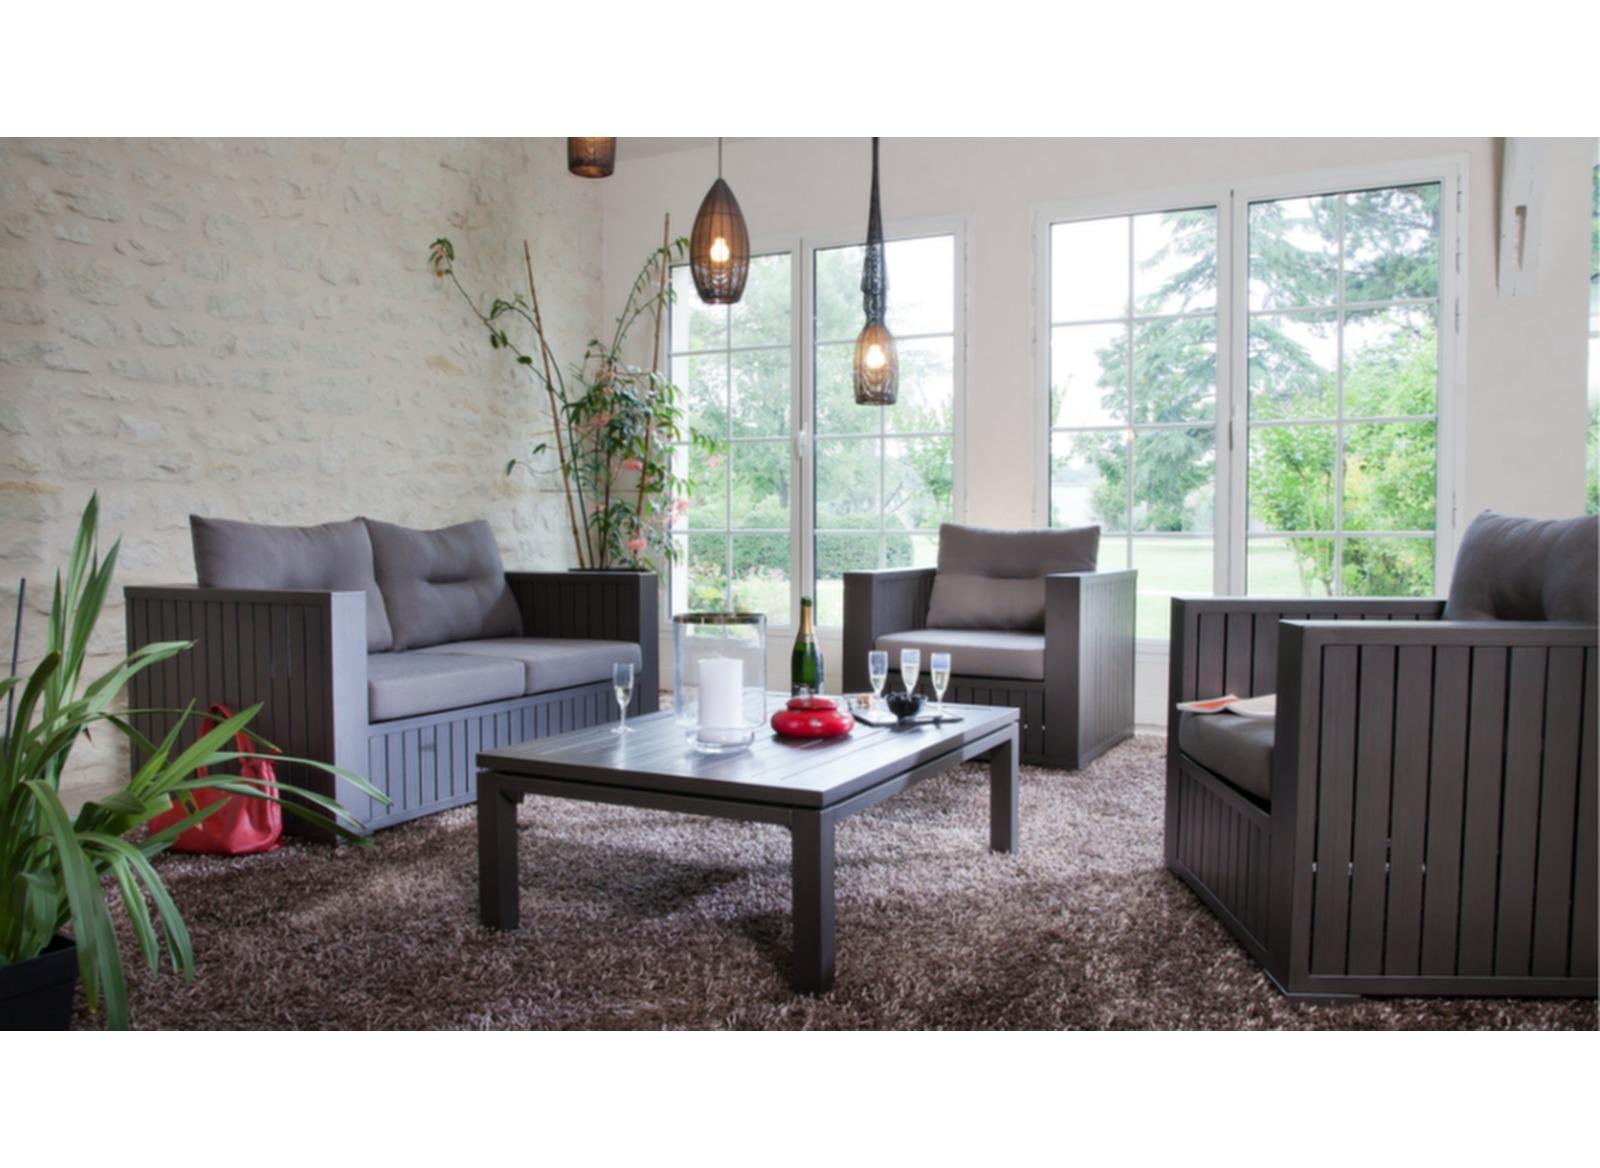 canap ext rieur et int rieur 2pl latino oc o. Black Bedroom Furniture Sets. Home Design Ideas